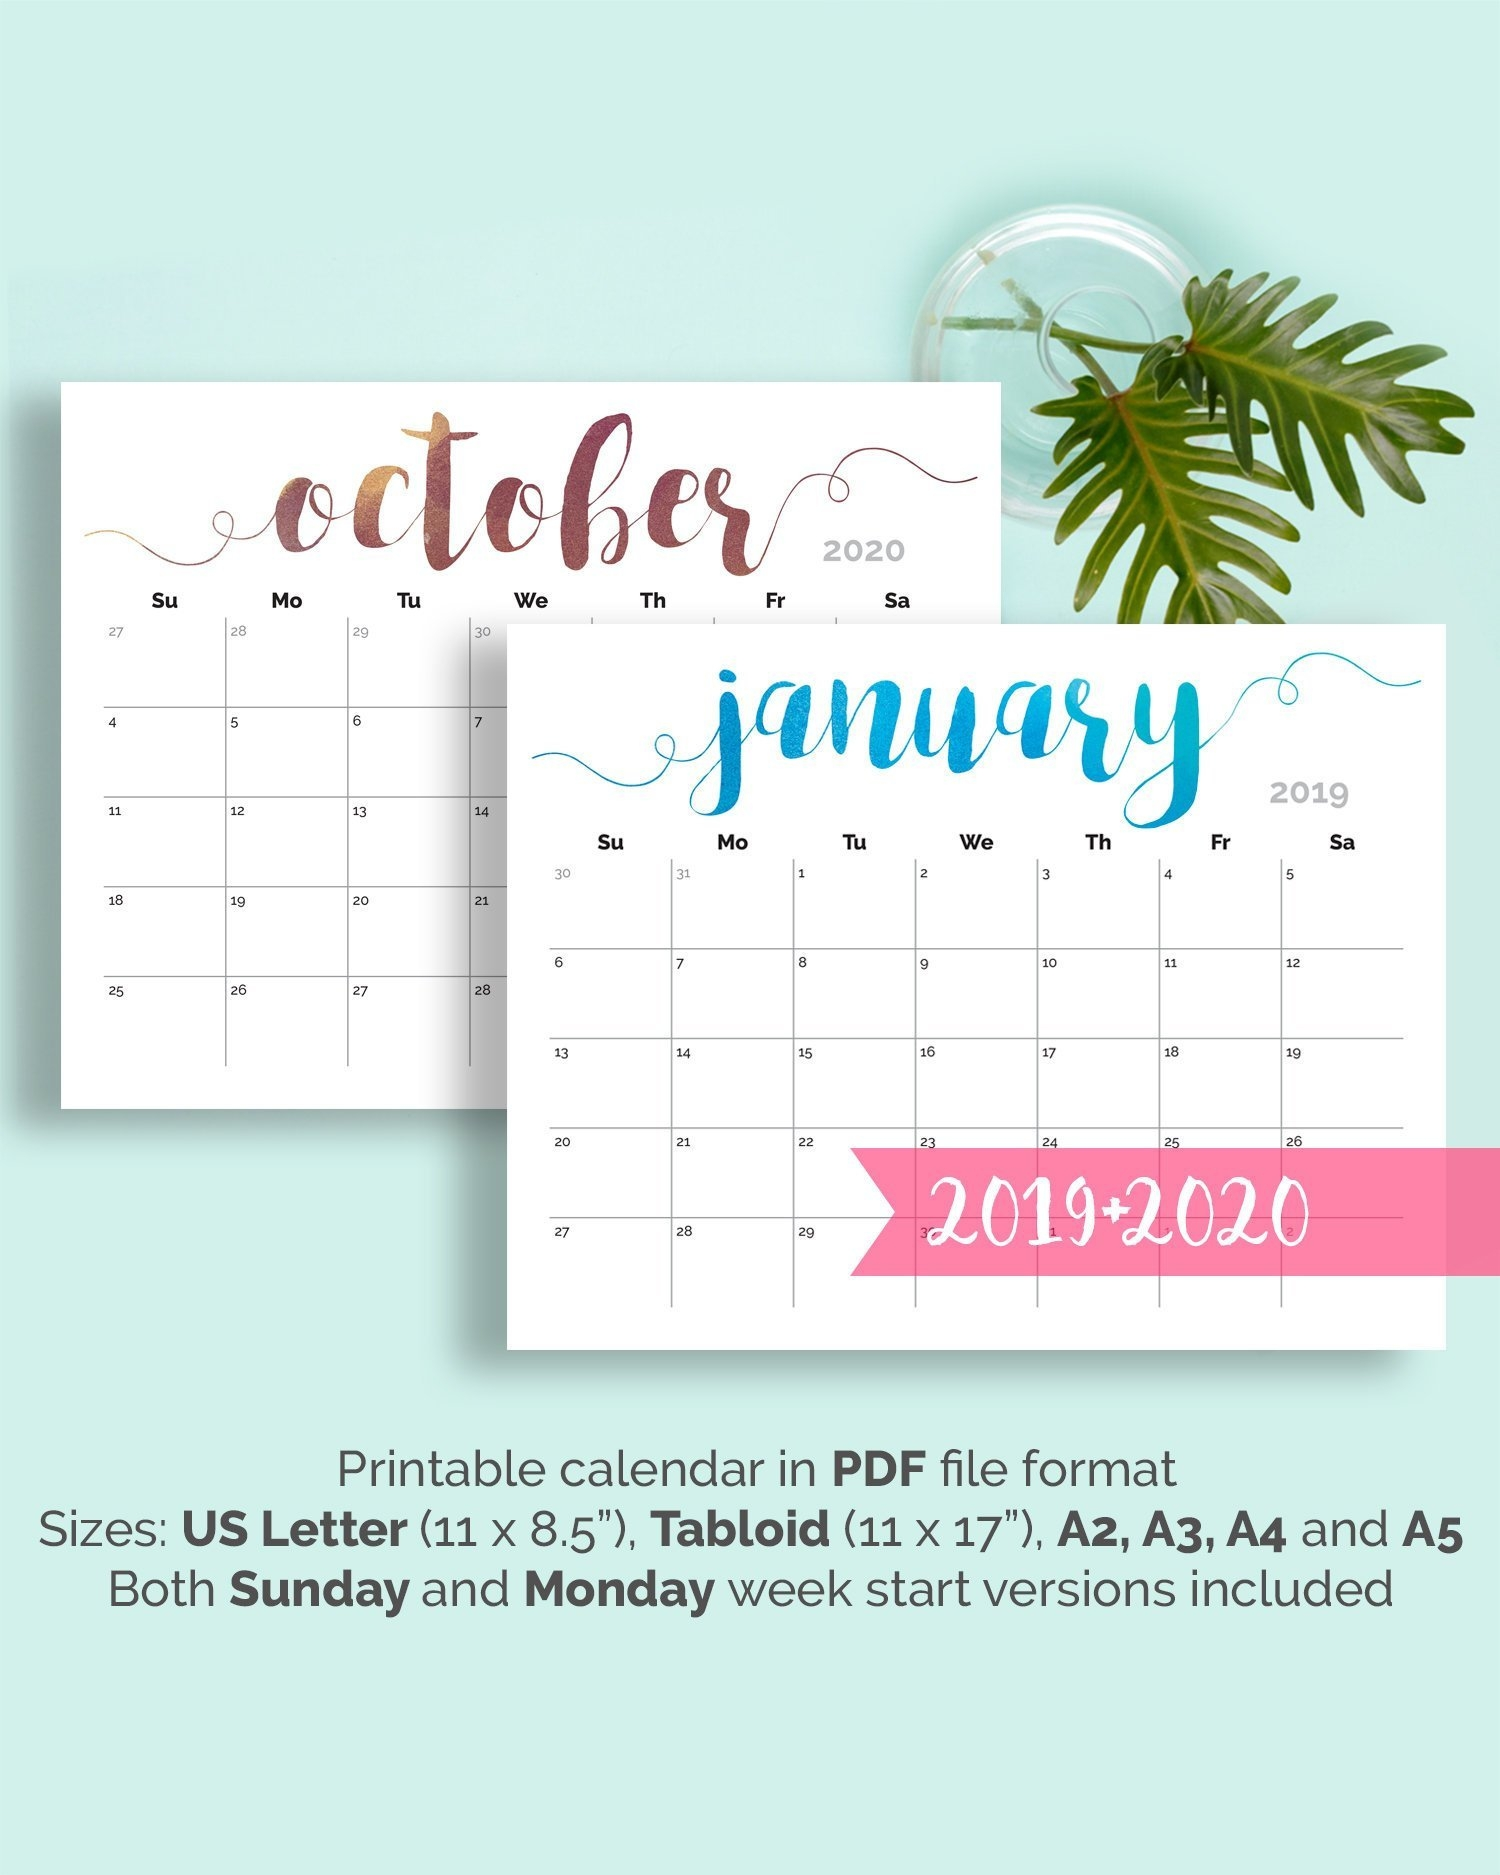 Printable Calendar 2019 Large Wall Calendar 2019 2020 Desk | Etsy School Calendar 2019 Zimbabwe